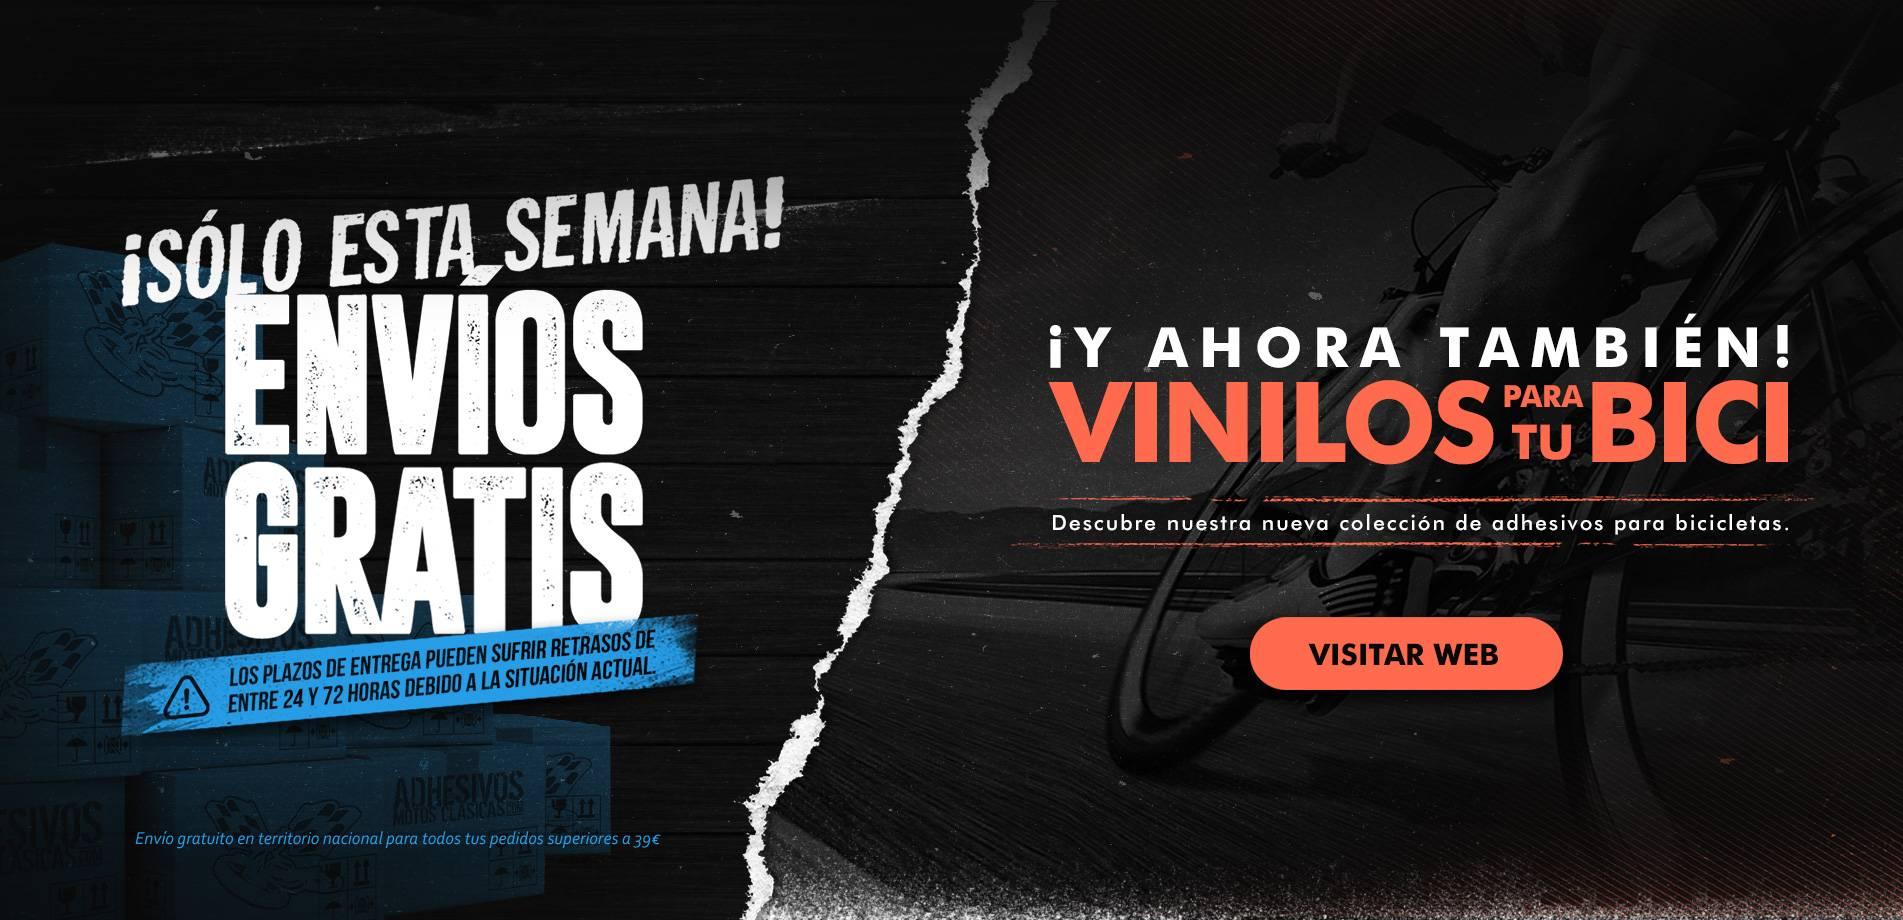 Vinilos Bici